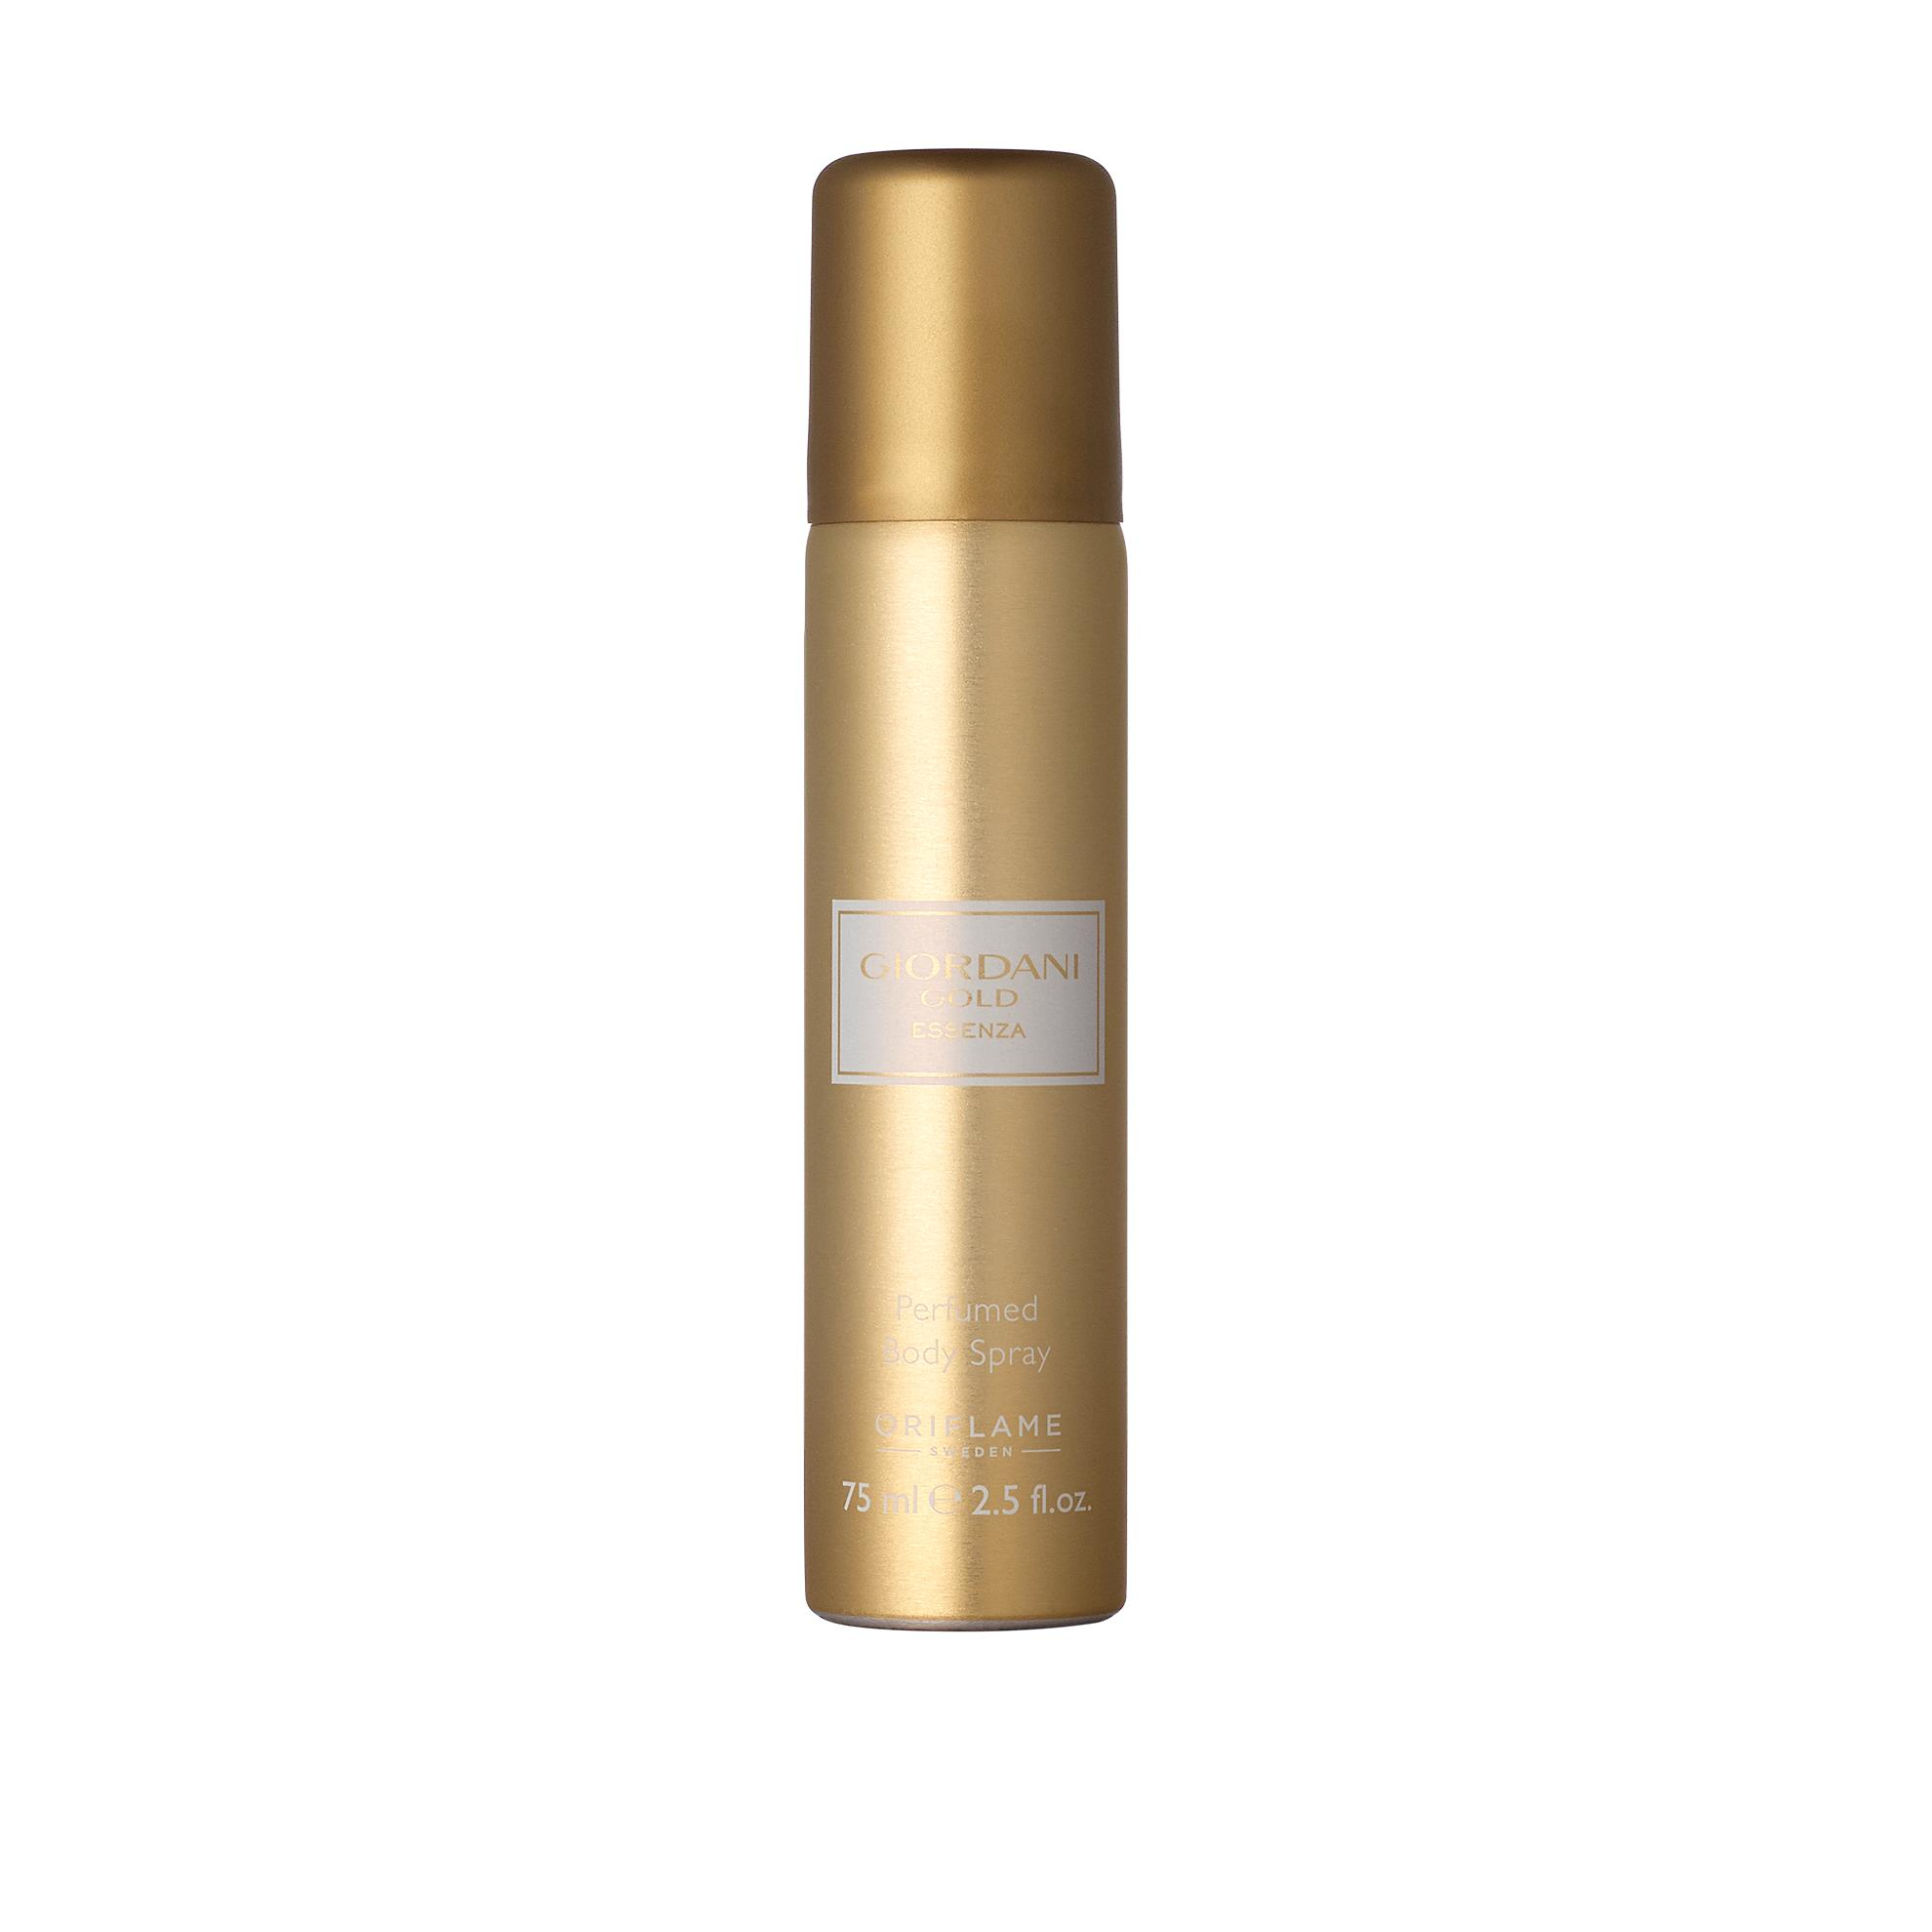 Giordani Gold Essenza dezodoráló spray